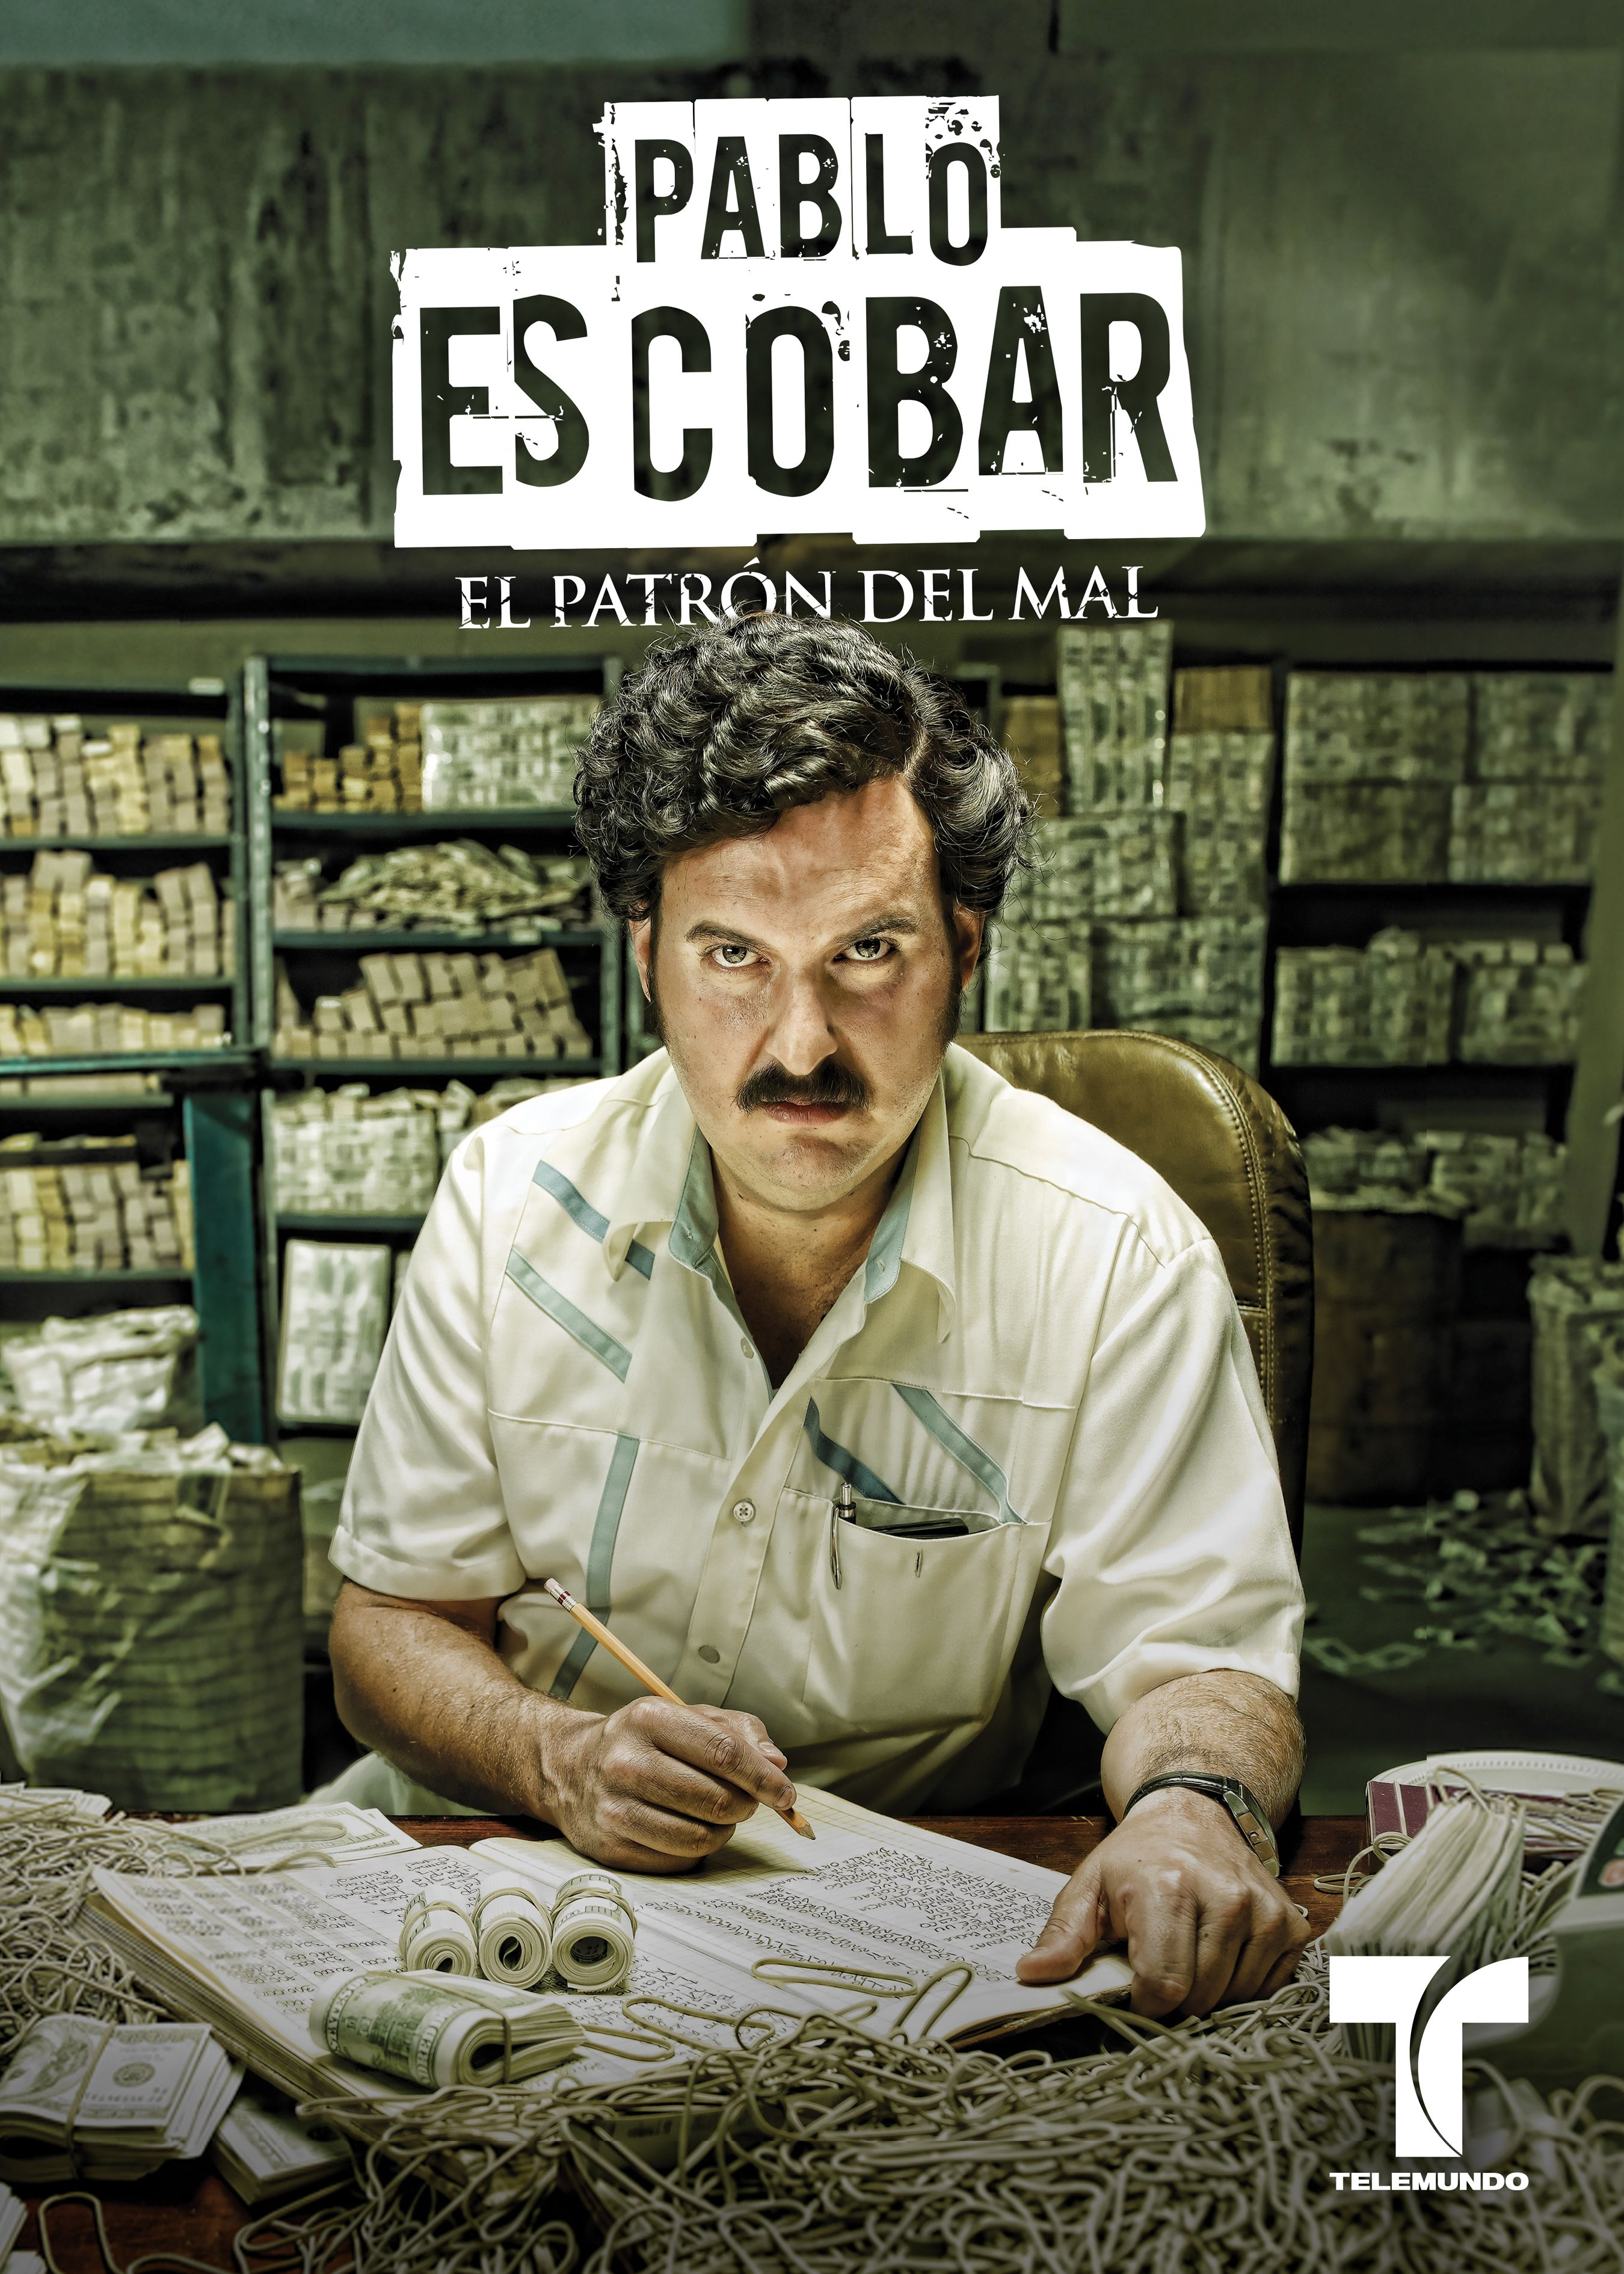 patron del mal poster pablo escobar boxes and chang e 3 on pinterest